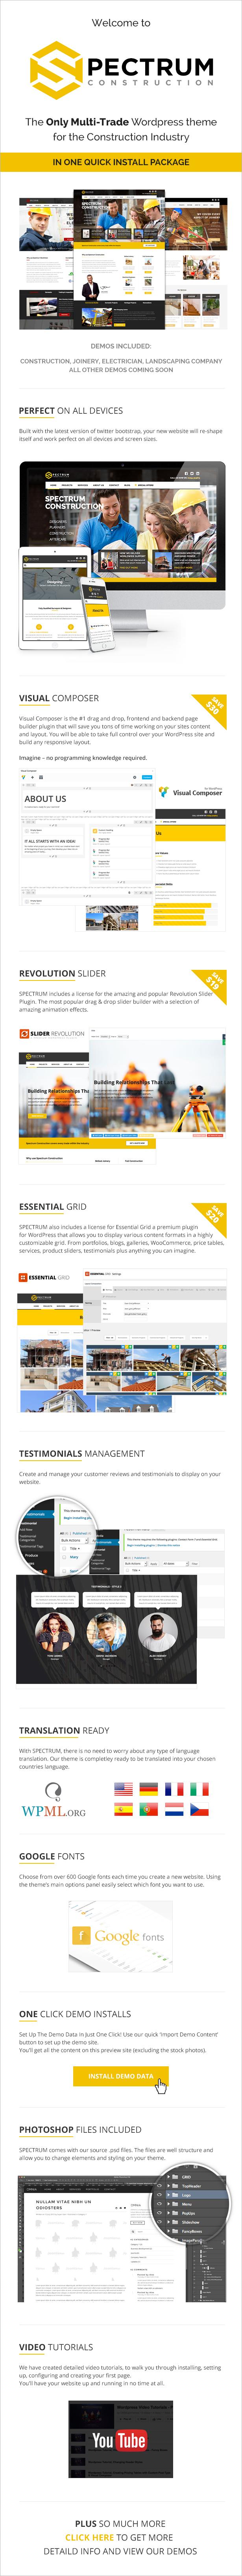 Spectrum - Multi-Trade Construction Business Theme - 20